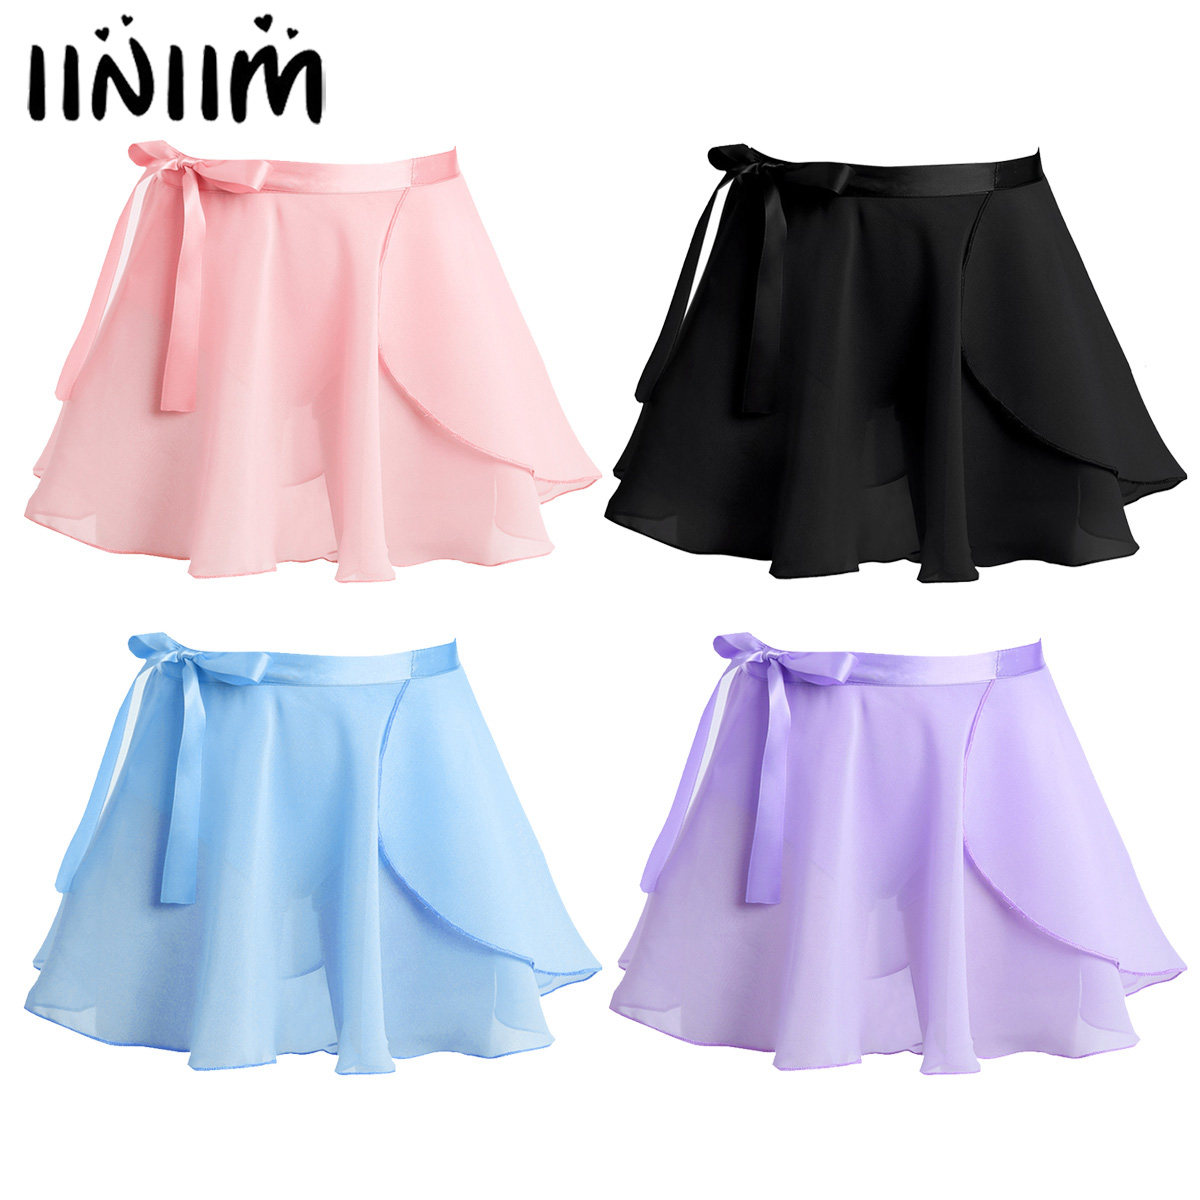 Ballet Dance Skirts for Kids Girls Dance Basic Classic Chiffon Mini Wrap Skirt with Tie Waist Tutu Danse Classique Costumes